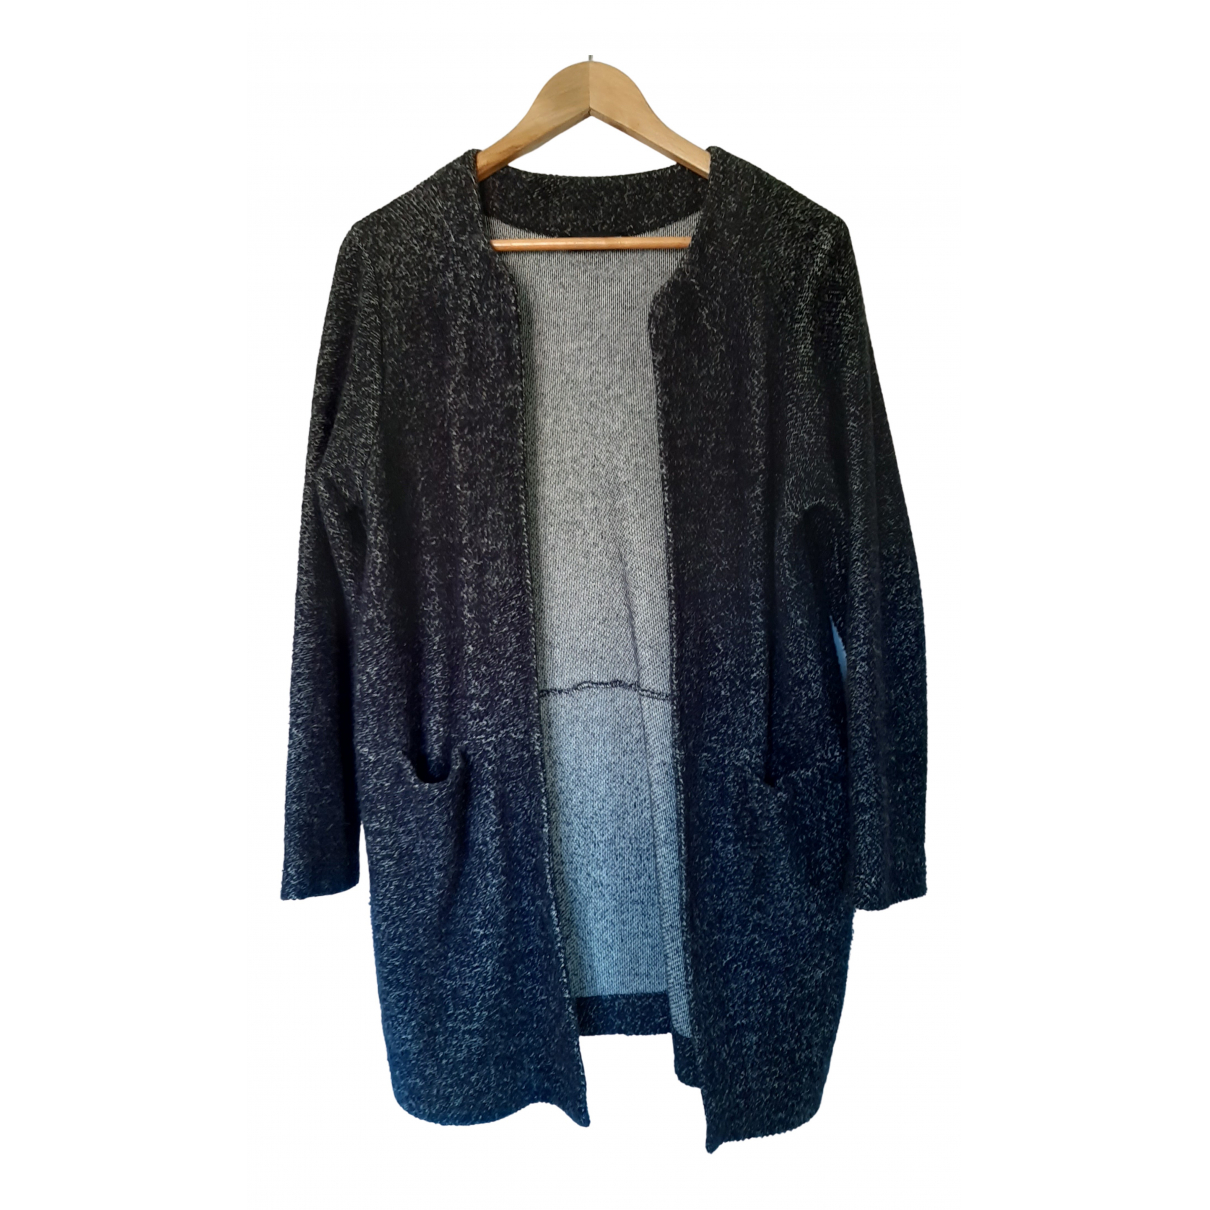 Zara N Black Cotton jacket for Women S International